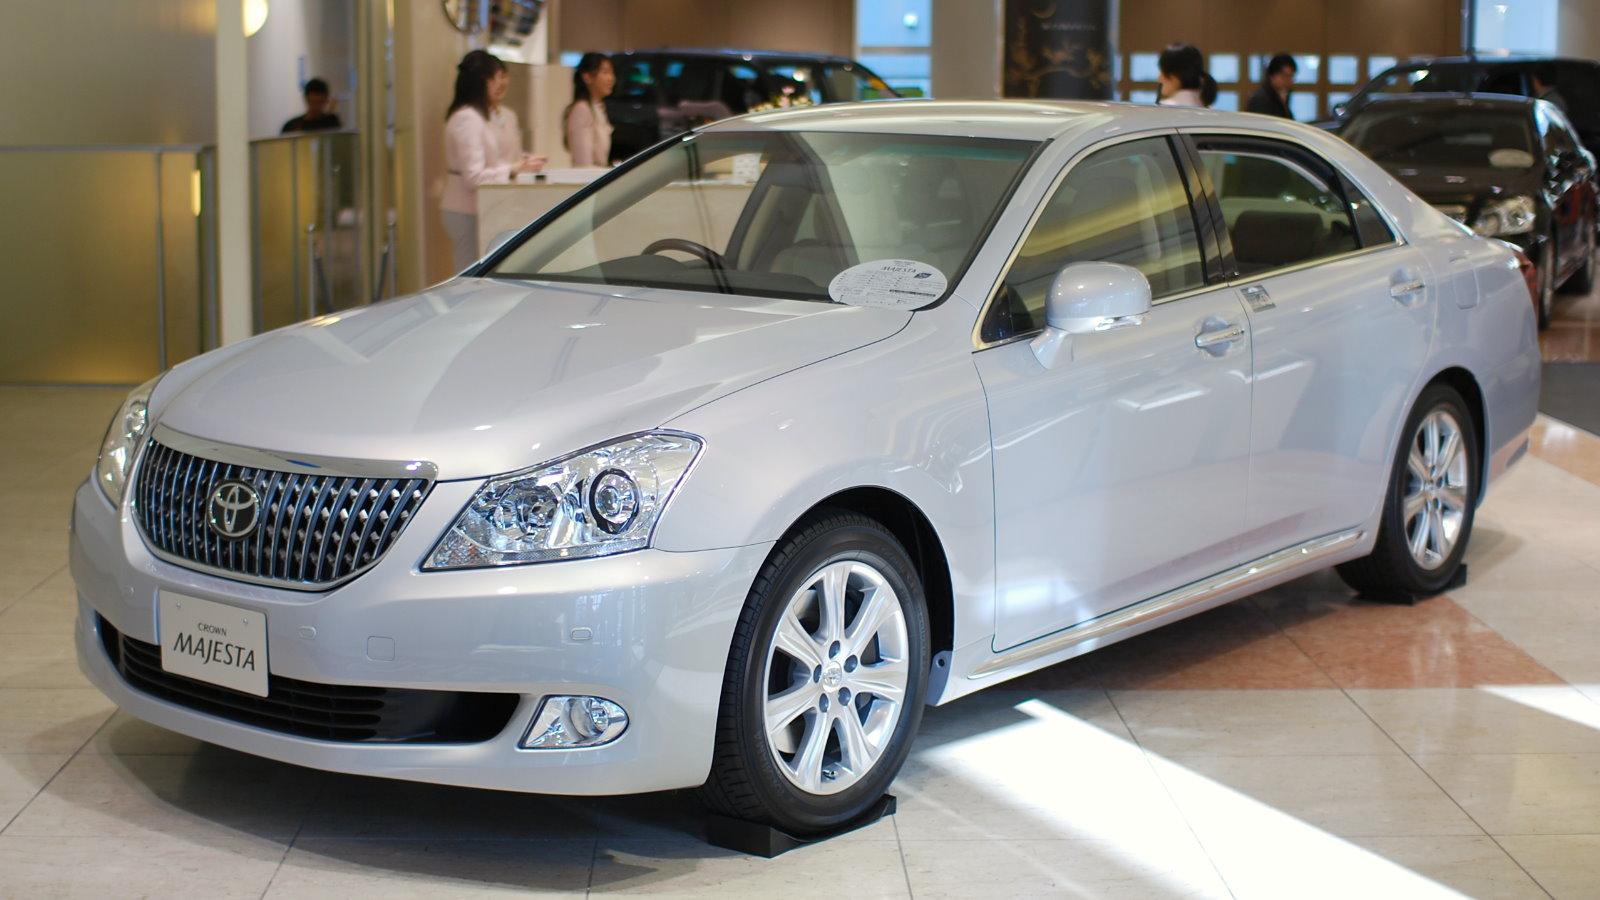 Toyota crown photo 11